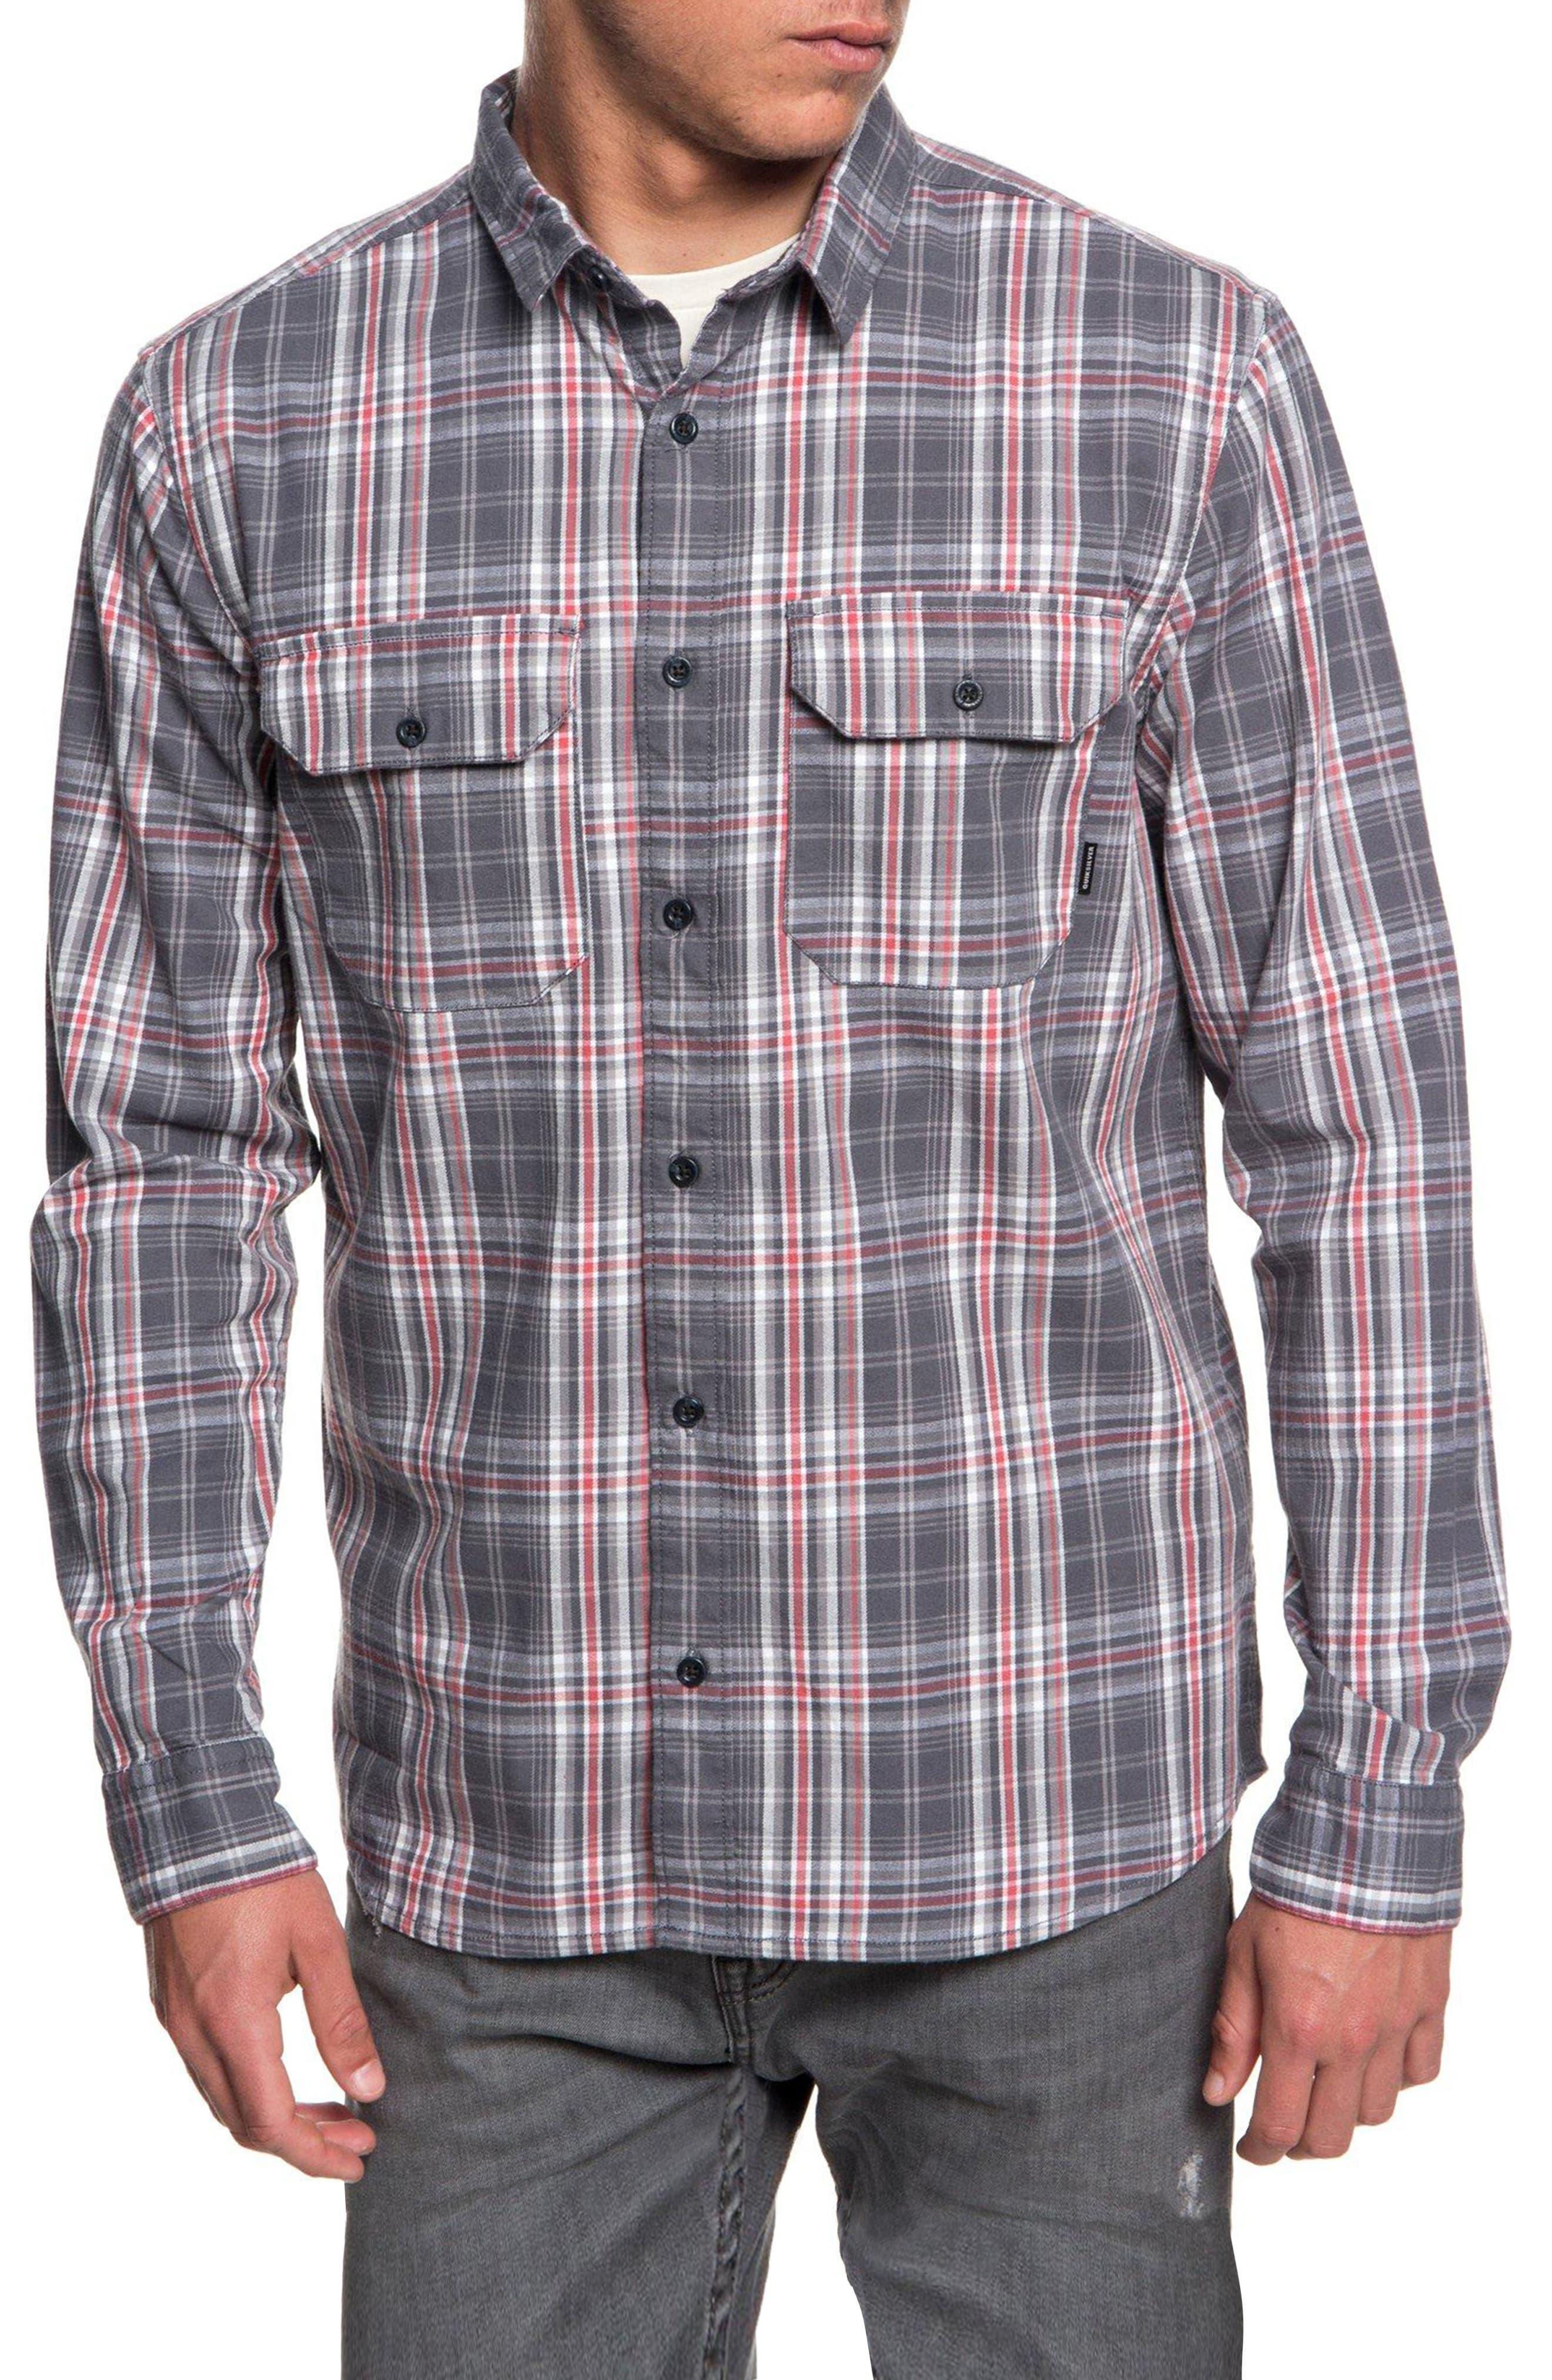 Fitz Sport Shirt,                         Main,                         color, IRON GATE FITZ CHECK